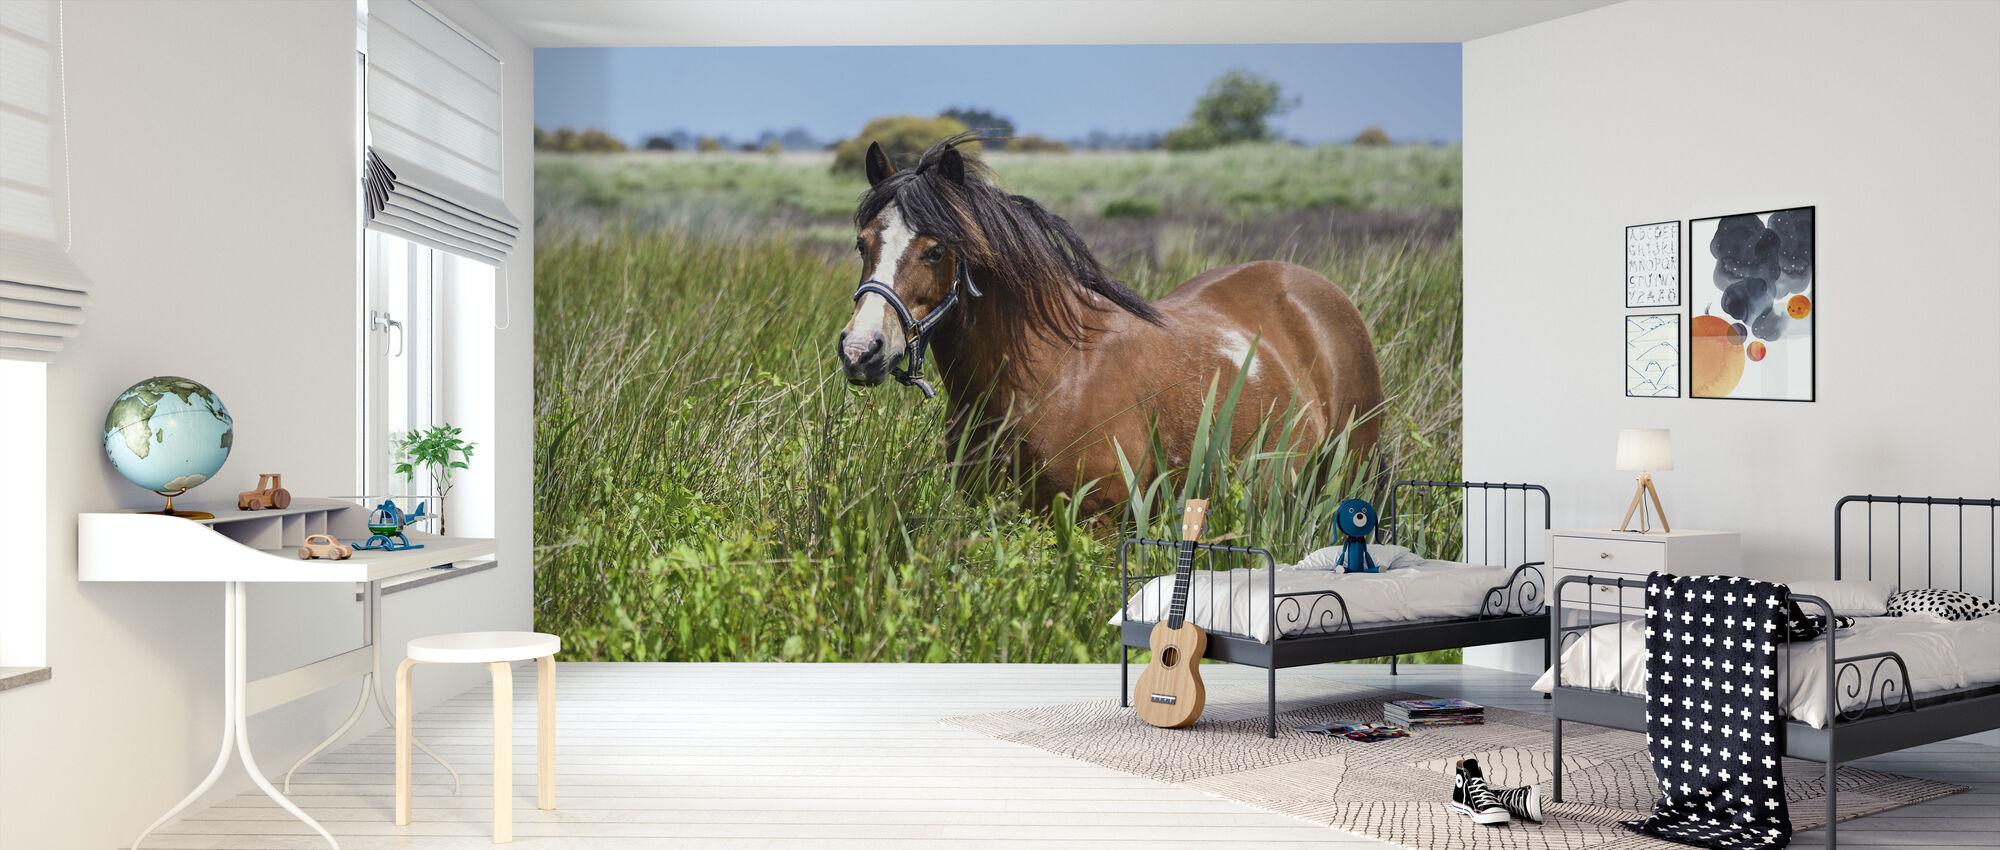 Pony - Wallpaper - Kids Room